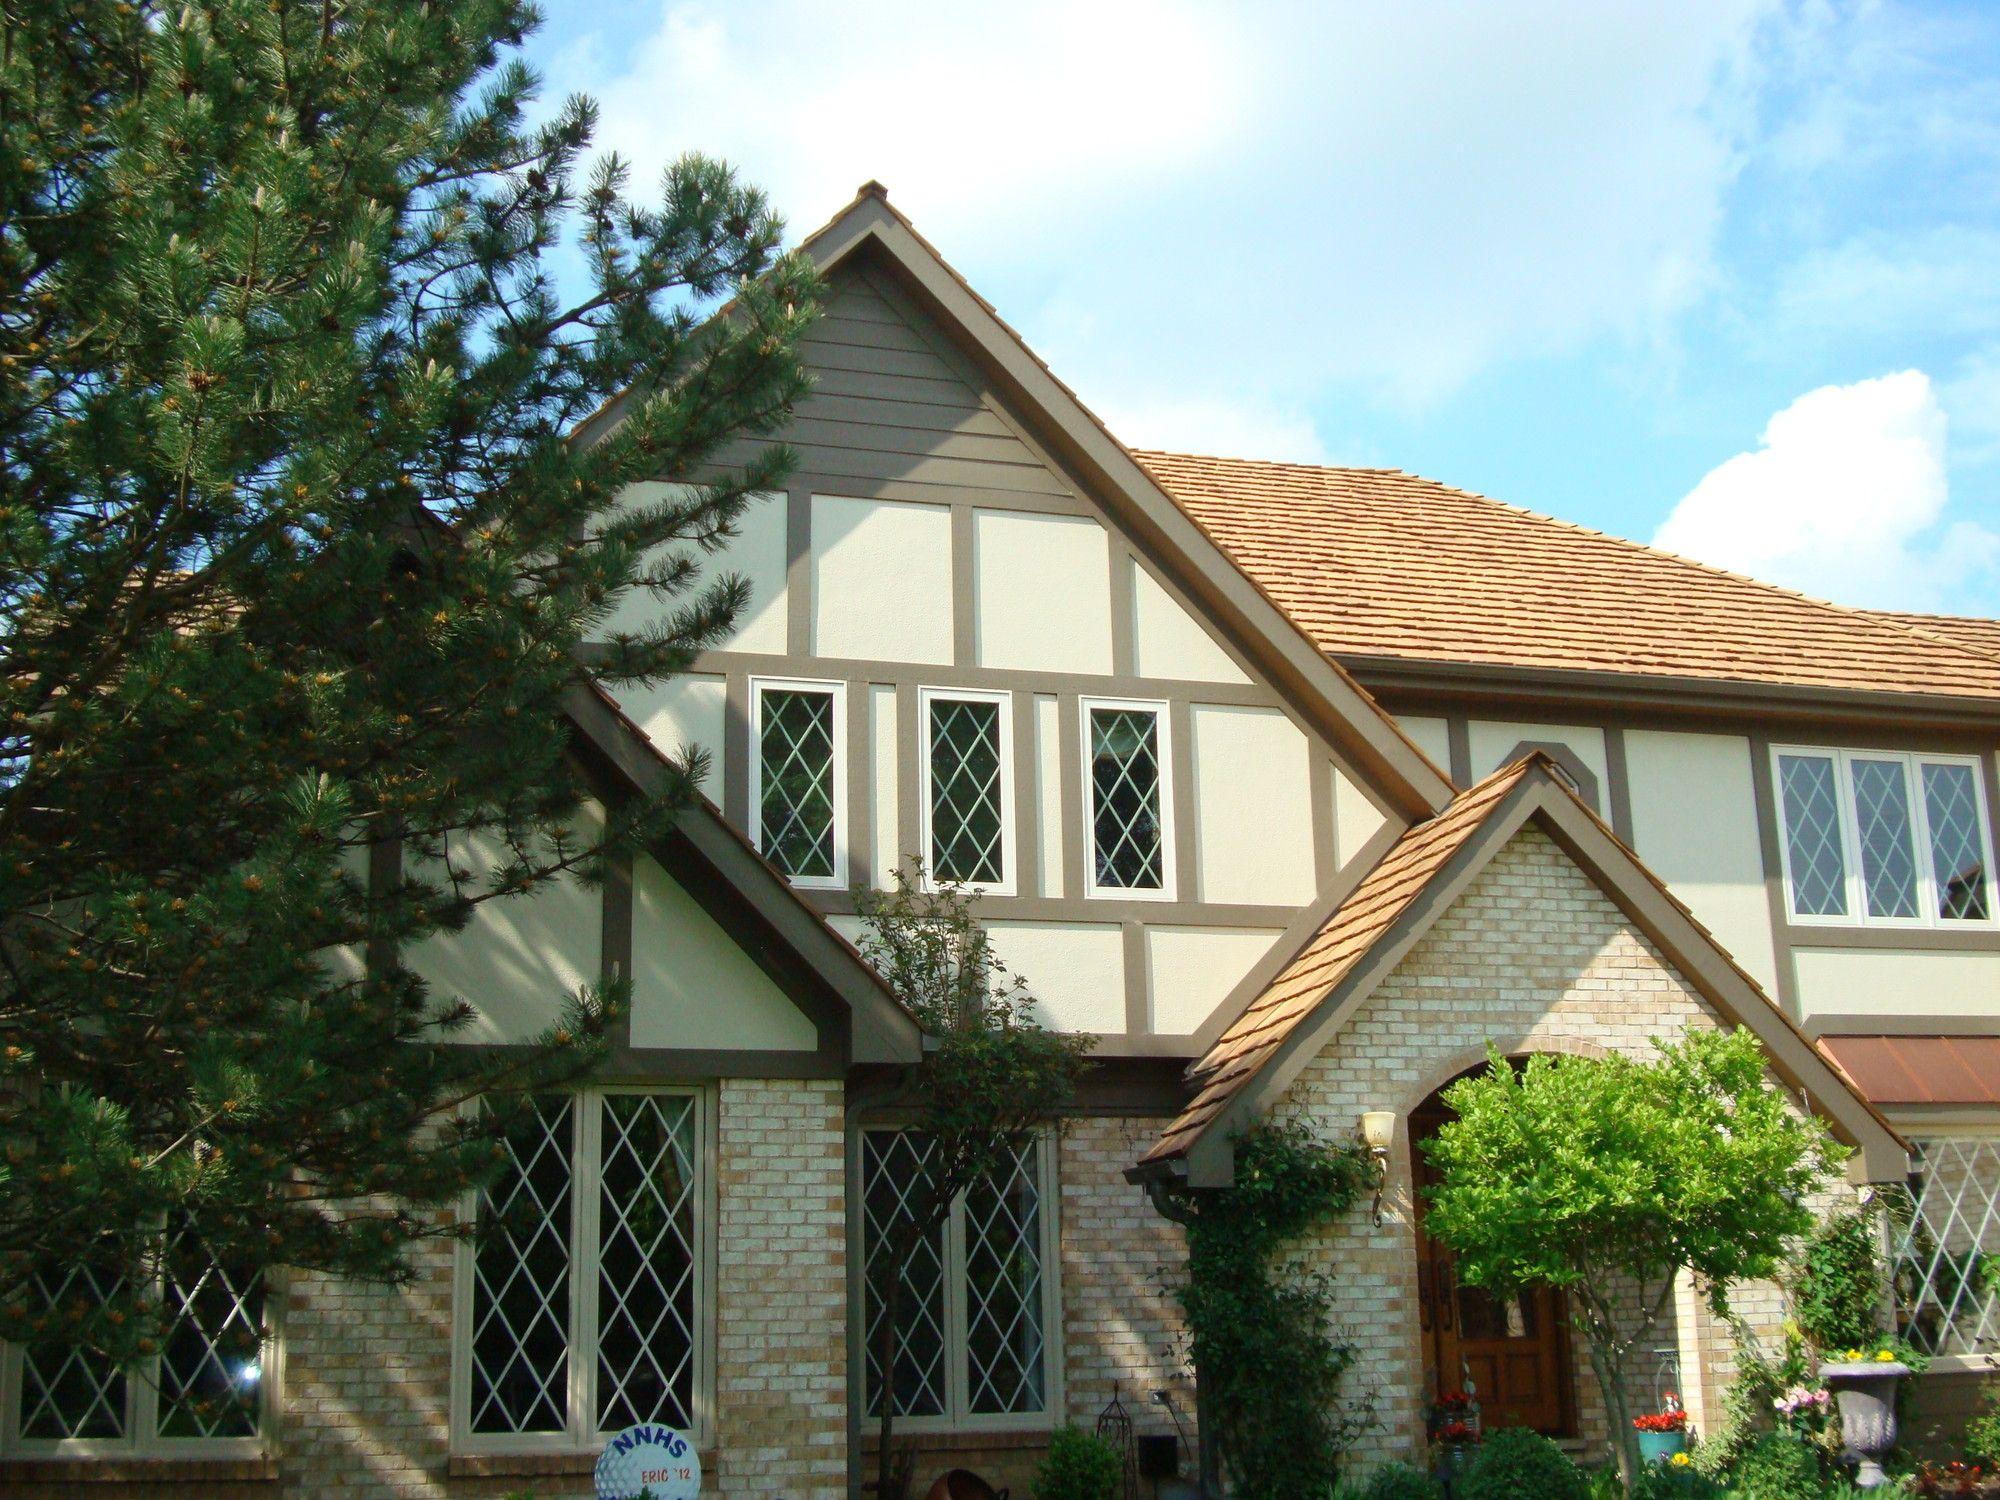 A Classic Tudor Look With Hardiepanel And Hardietrim House Siding Tudor Style Homes Tudor Style